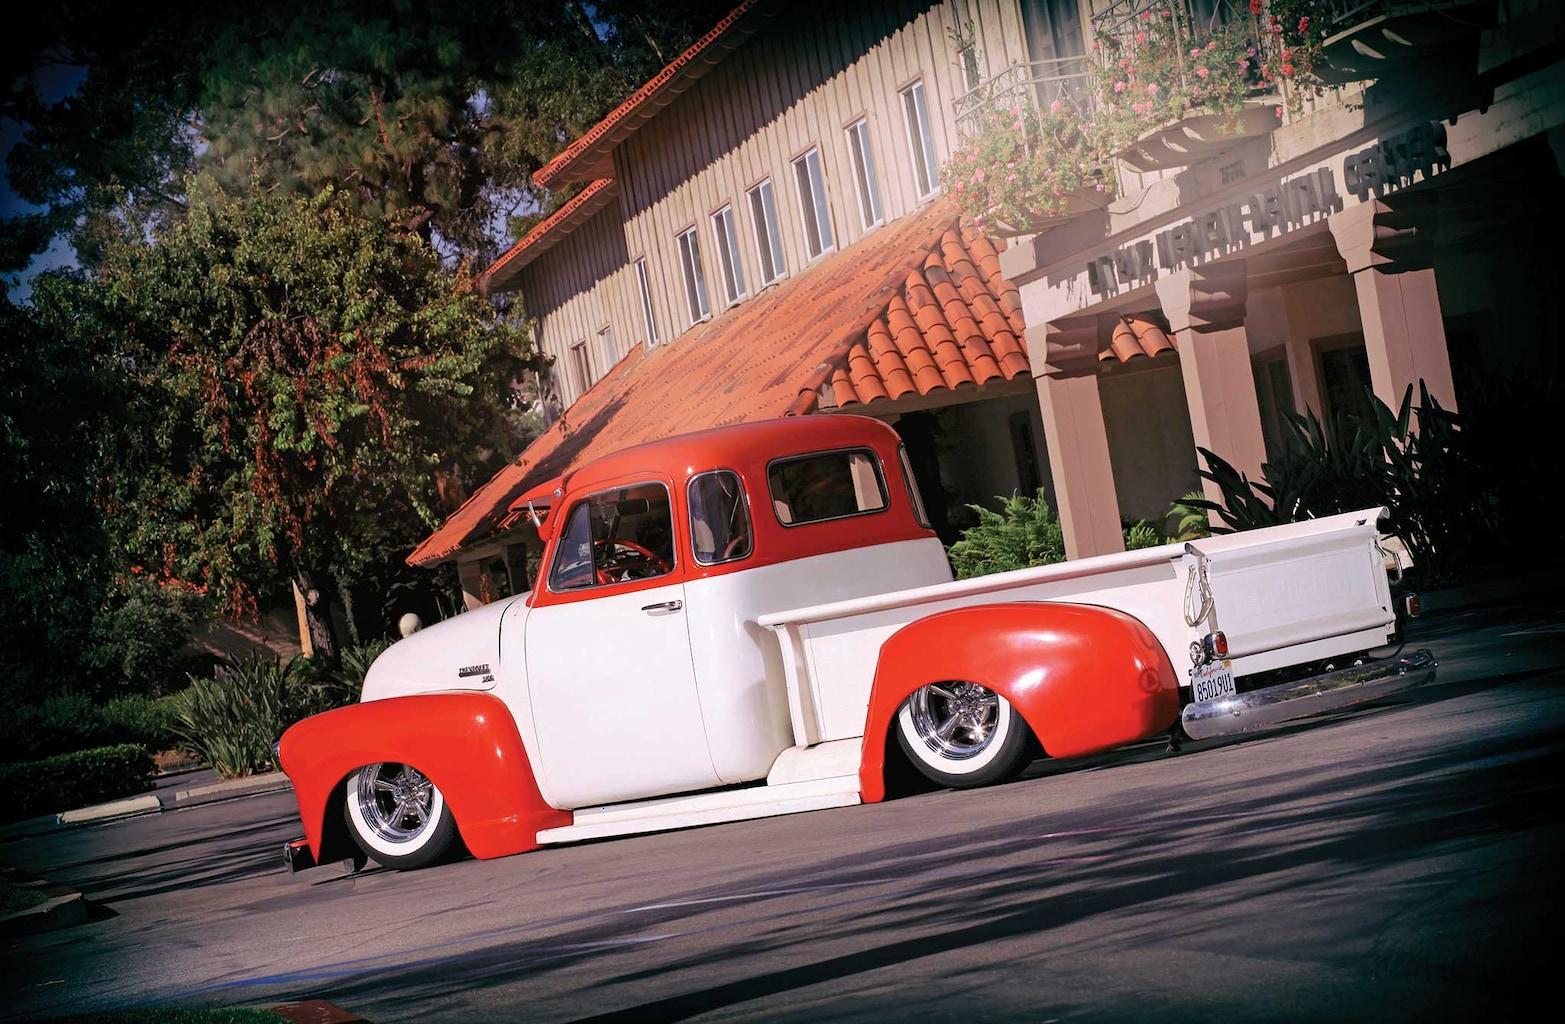 LSX 5.3 in a '51 truck.